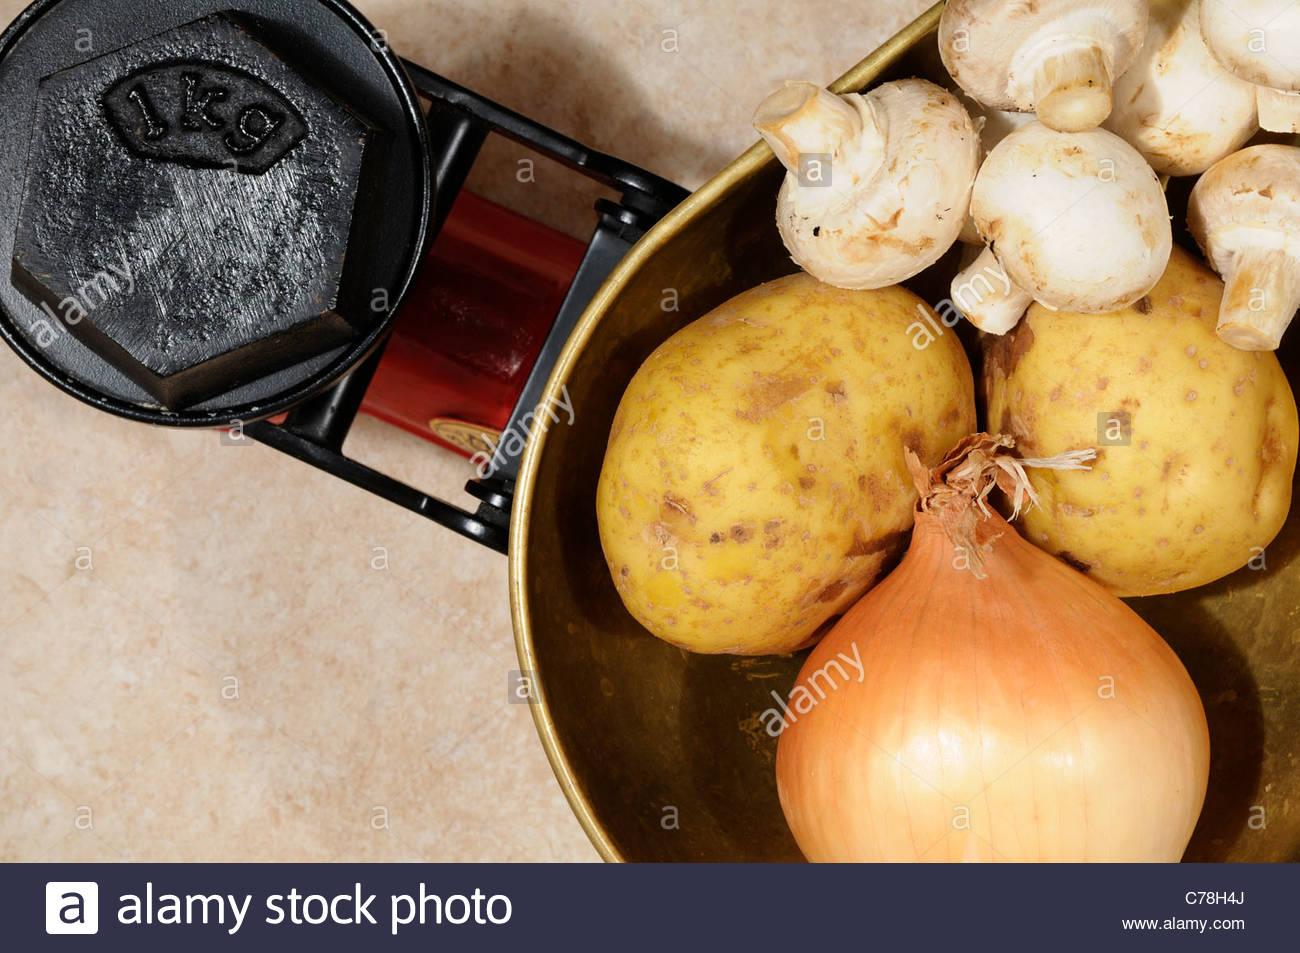 Mixed veg on Kitchen scales 1kg, England - Stock Image